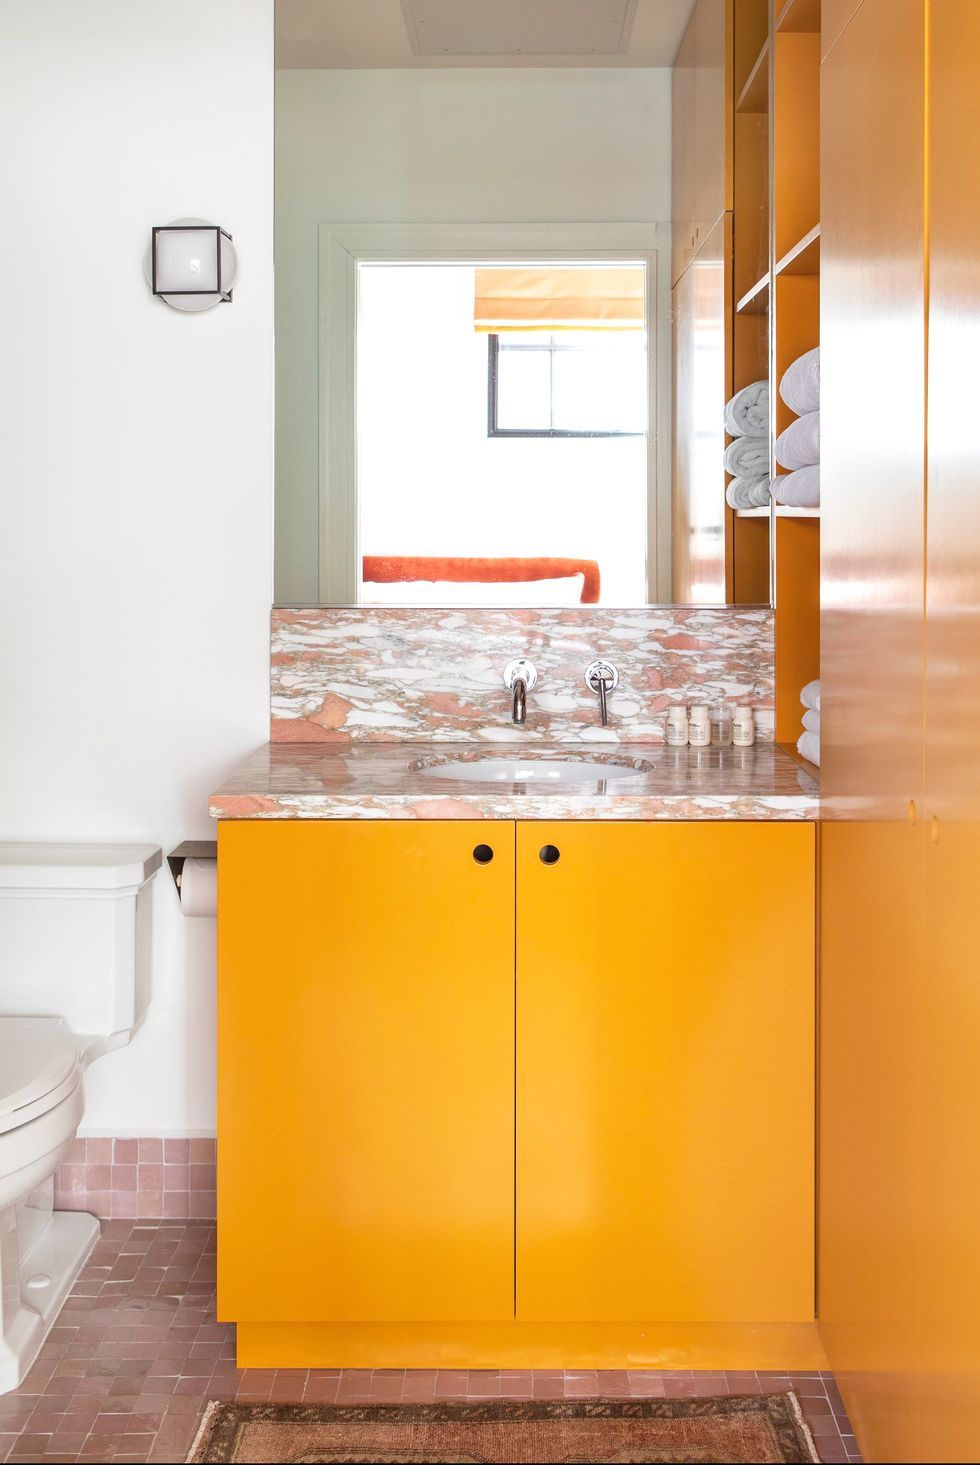 How Pink Became the Most Popular Color For Bathroom Design ...